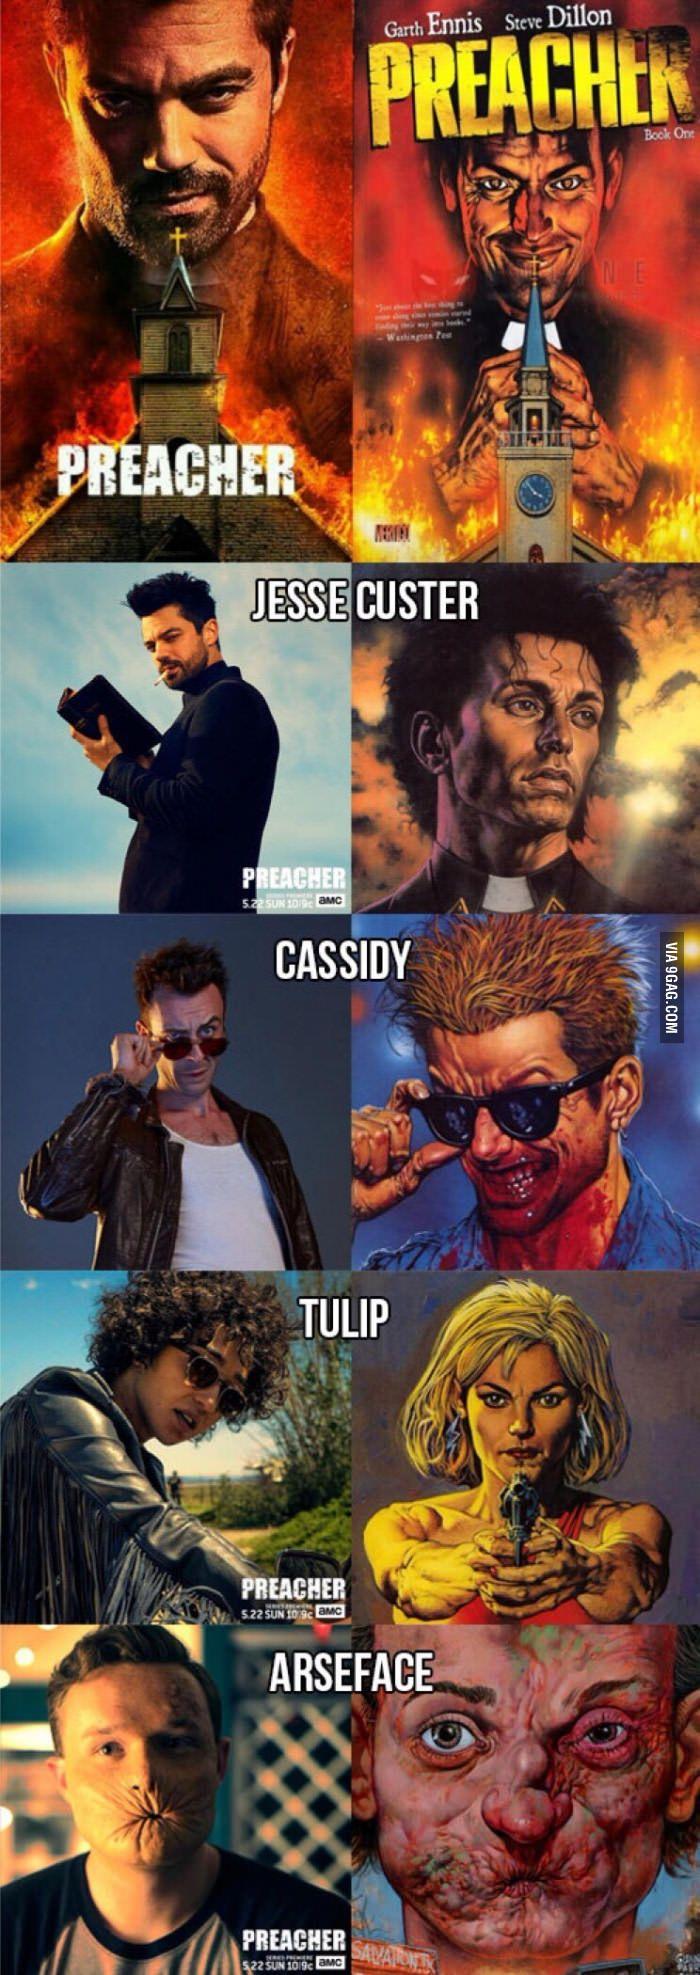 Show vs. comic-Joe Gilgun is PERFECT as Cassidy